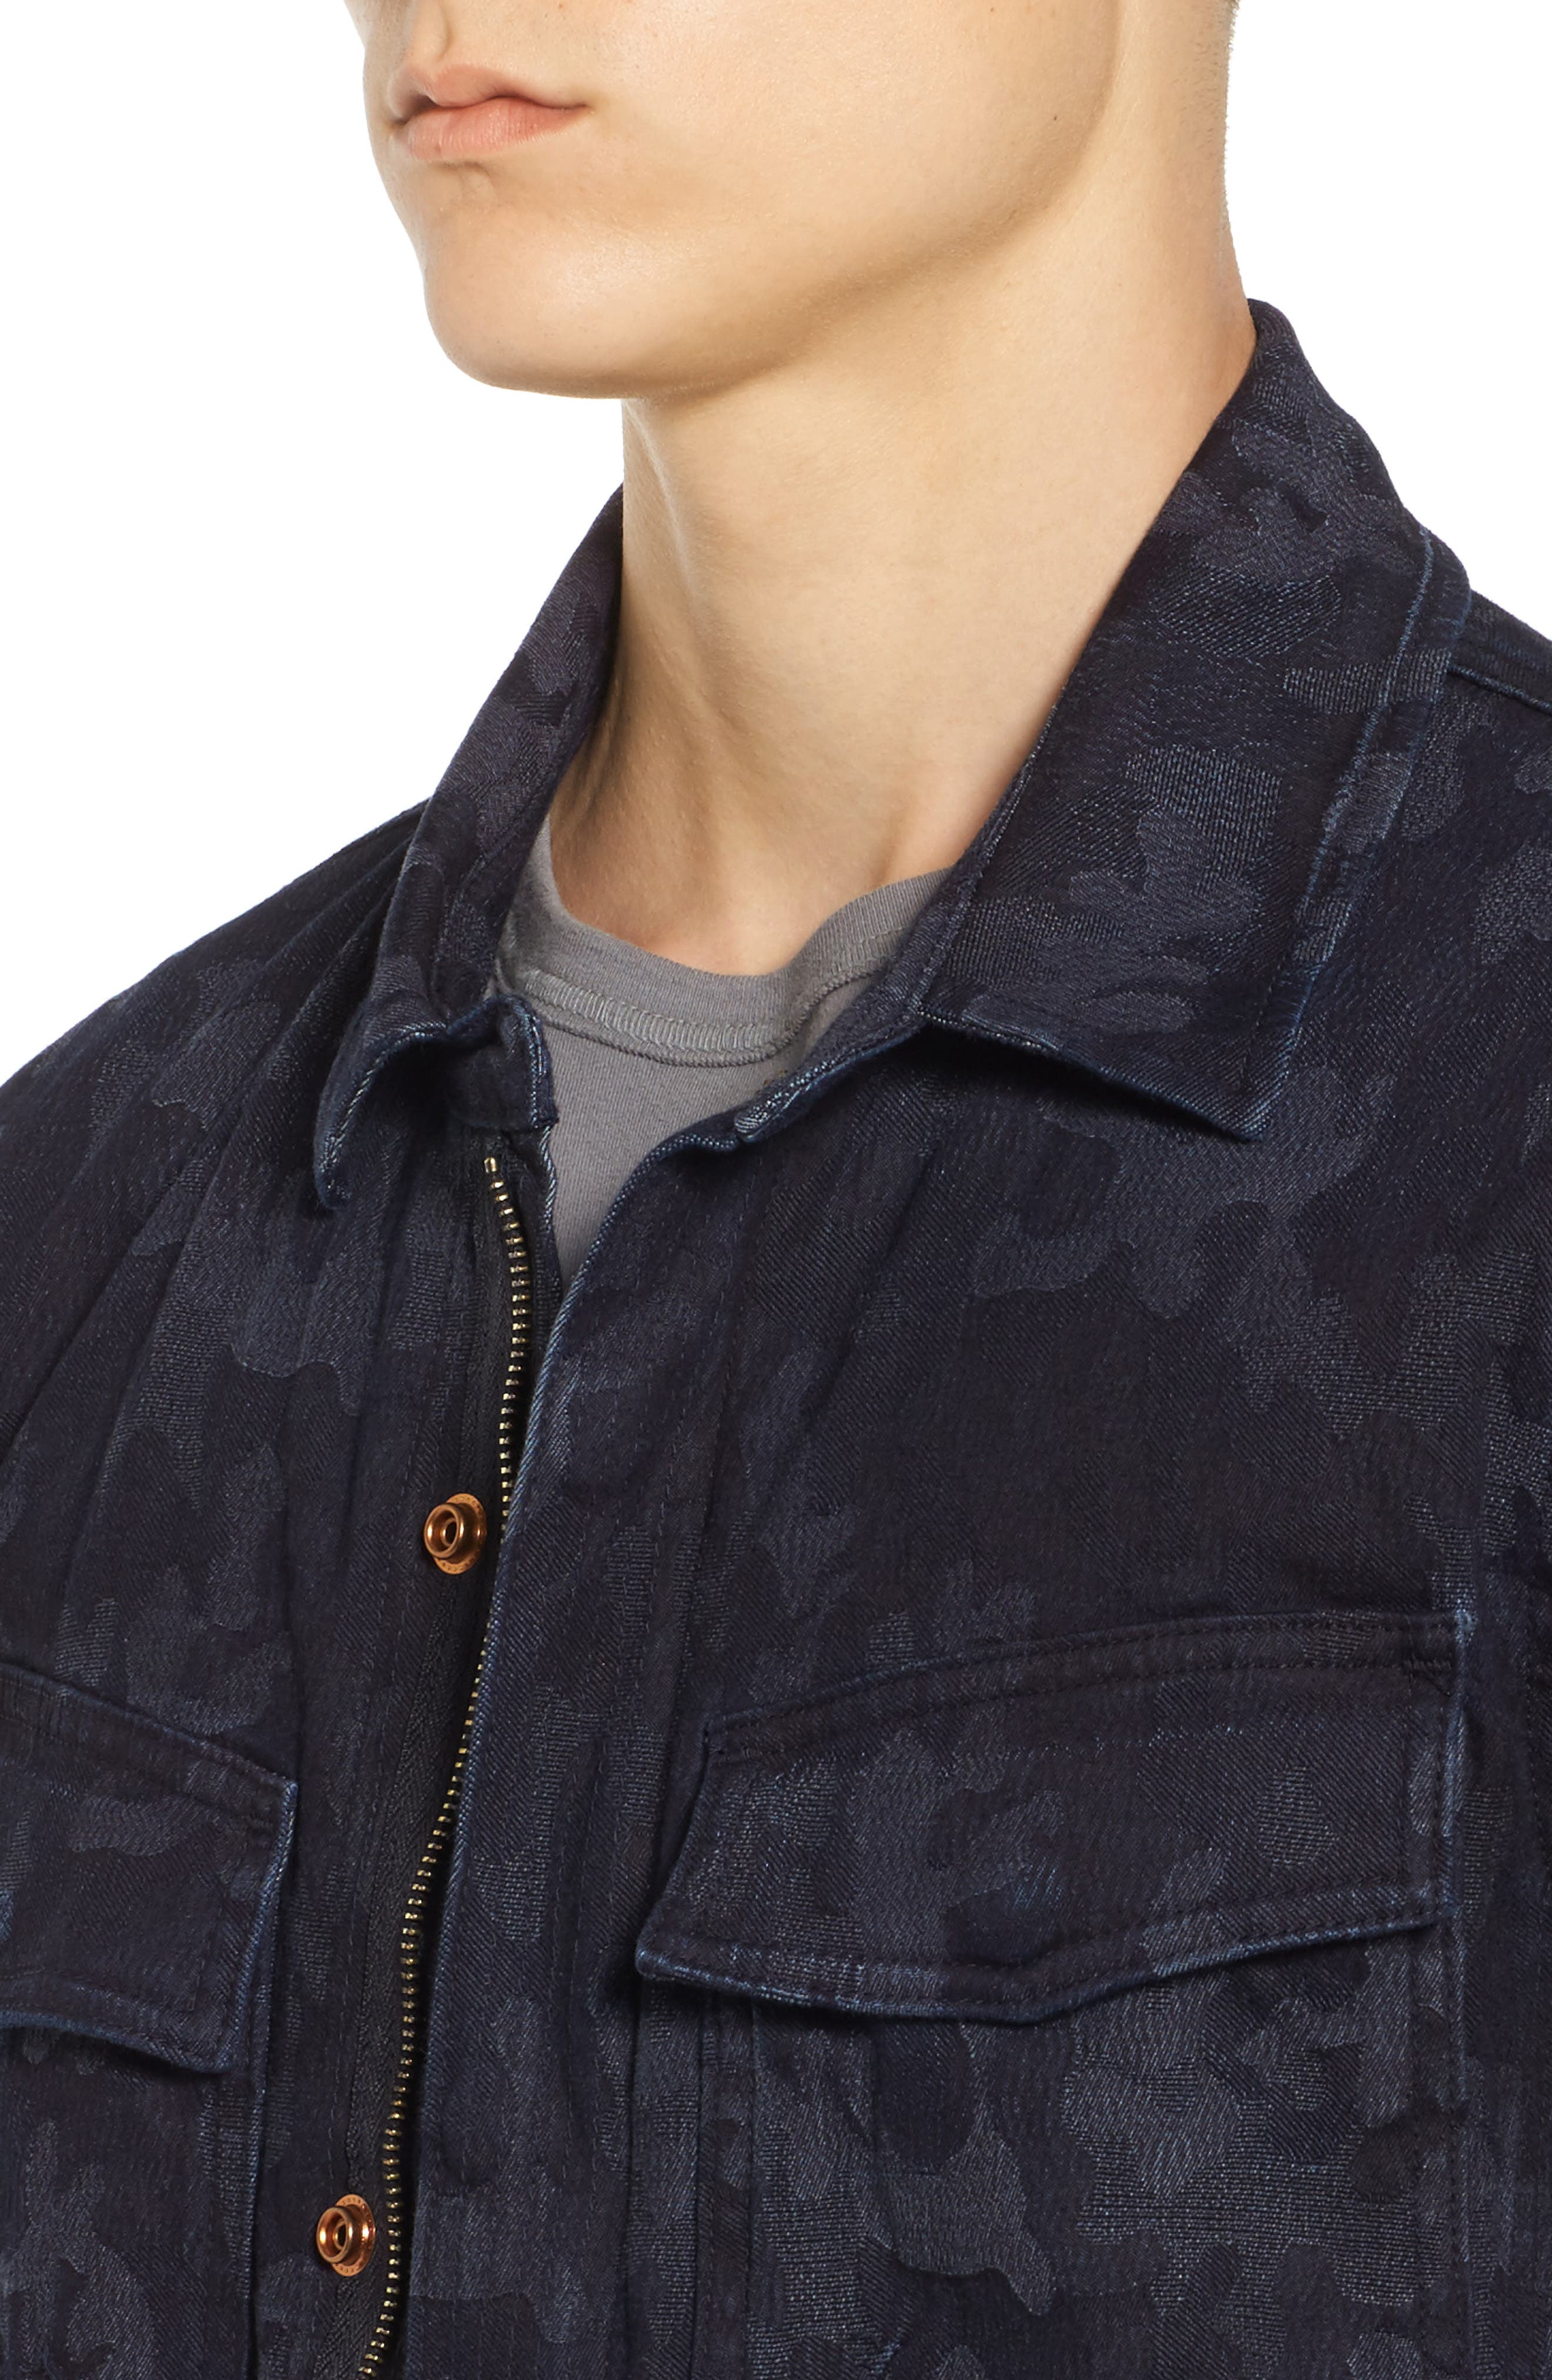 Camo Field Jacket,                             Alternate thumbnail 4, color,                             400